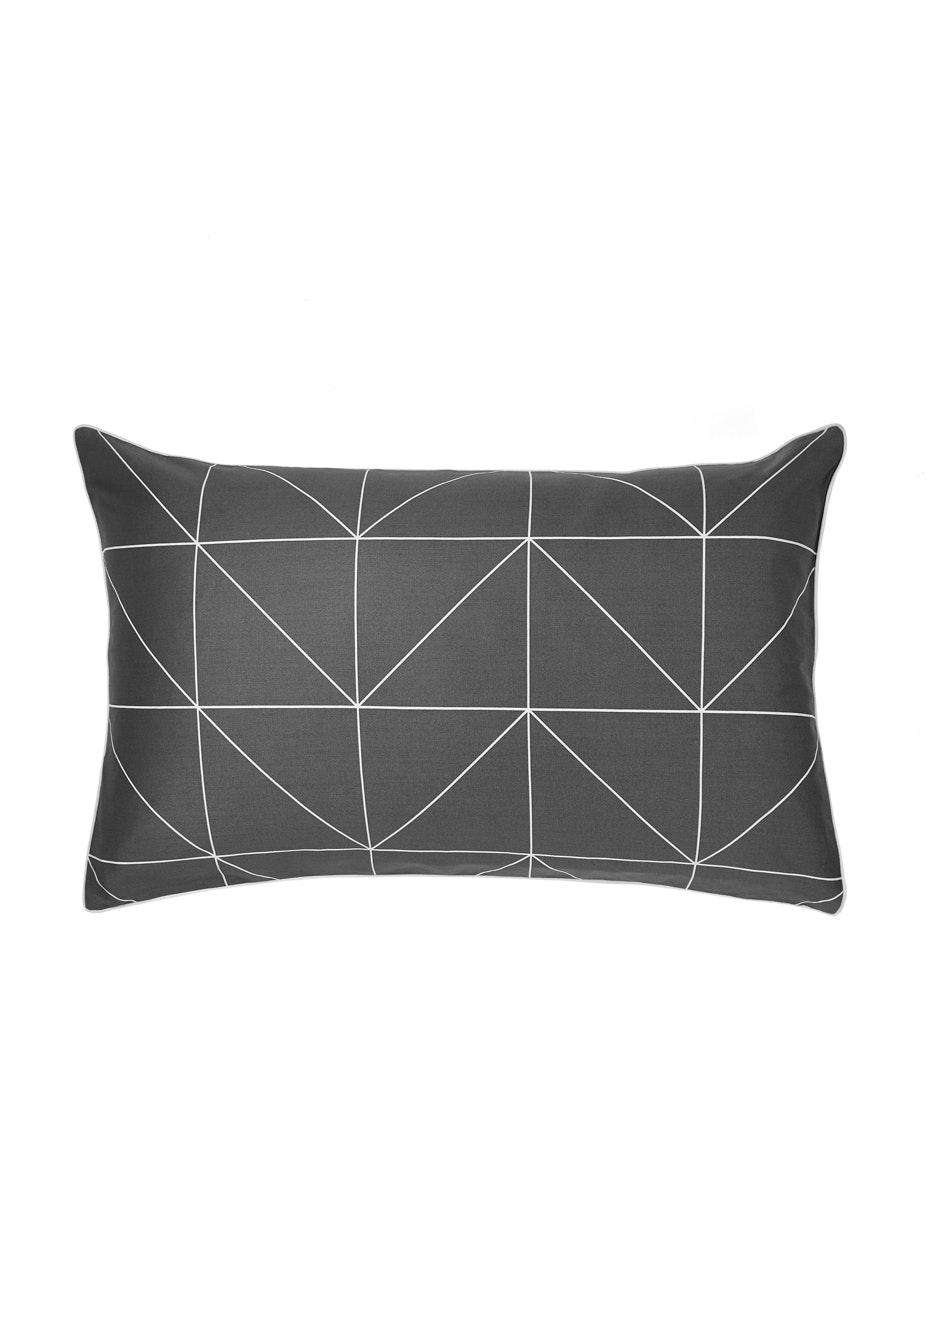 Aura Kami Std Pillow Case Ea Pillowcase - Standard Charcoal